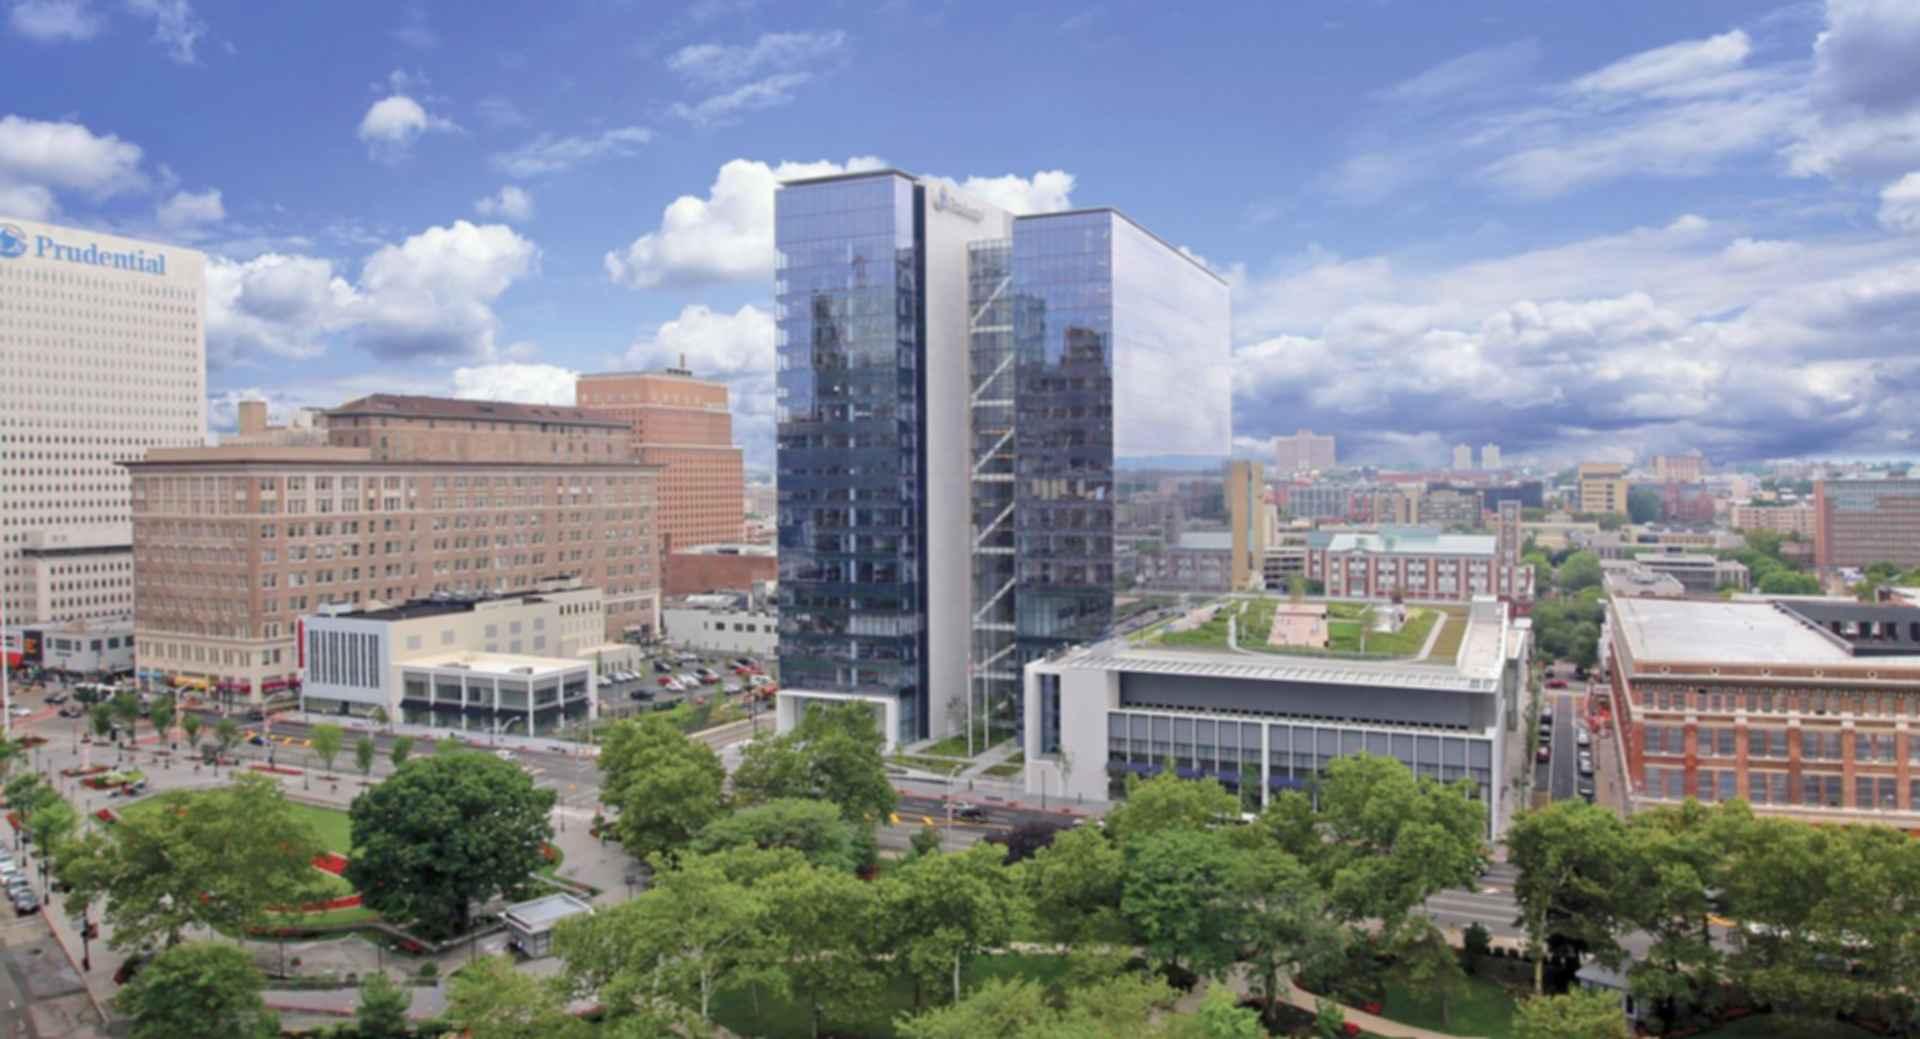 Prudential Newark